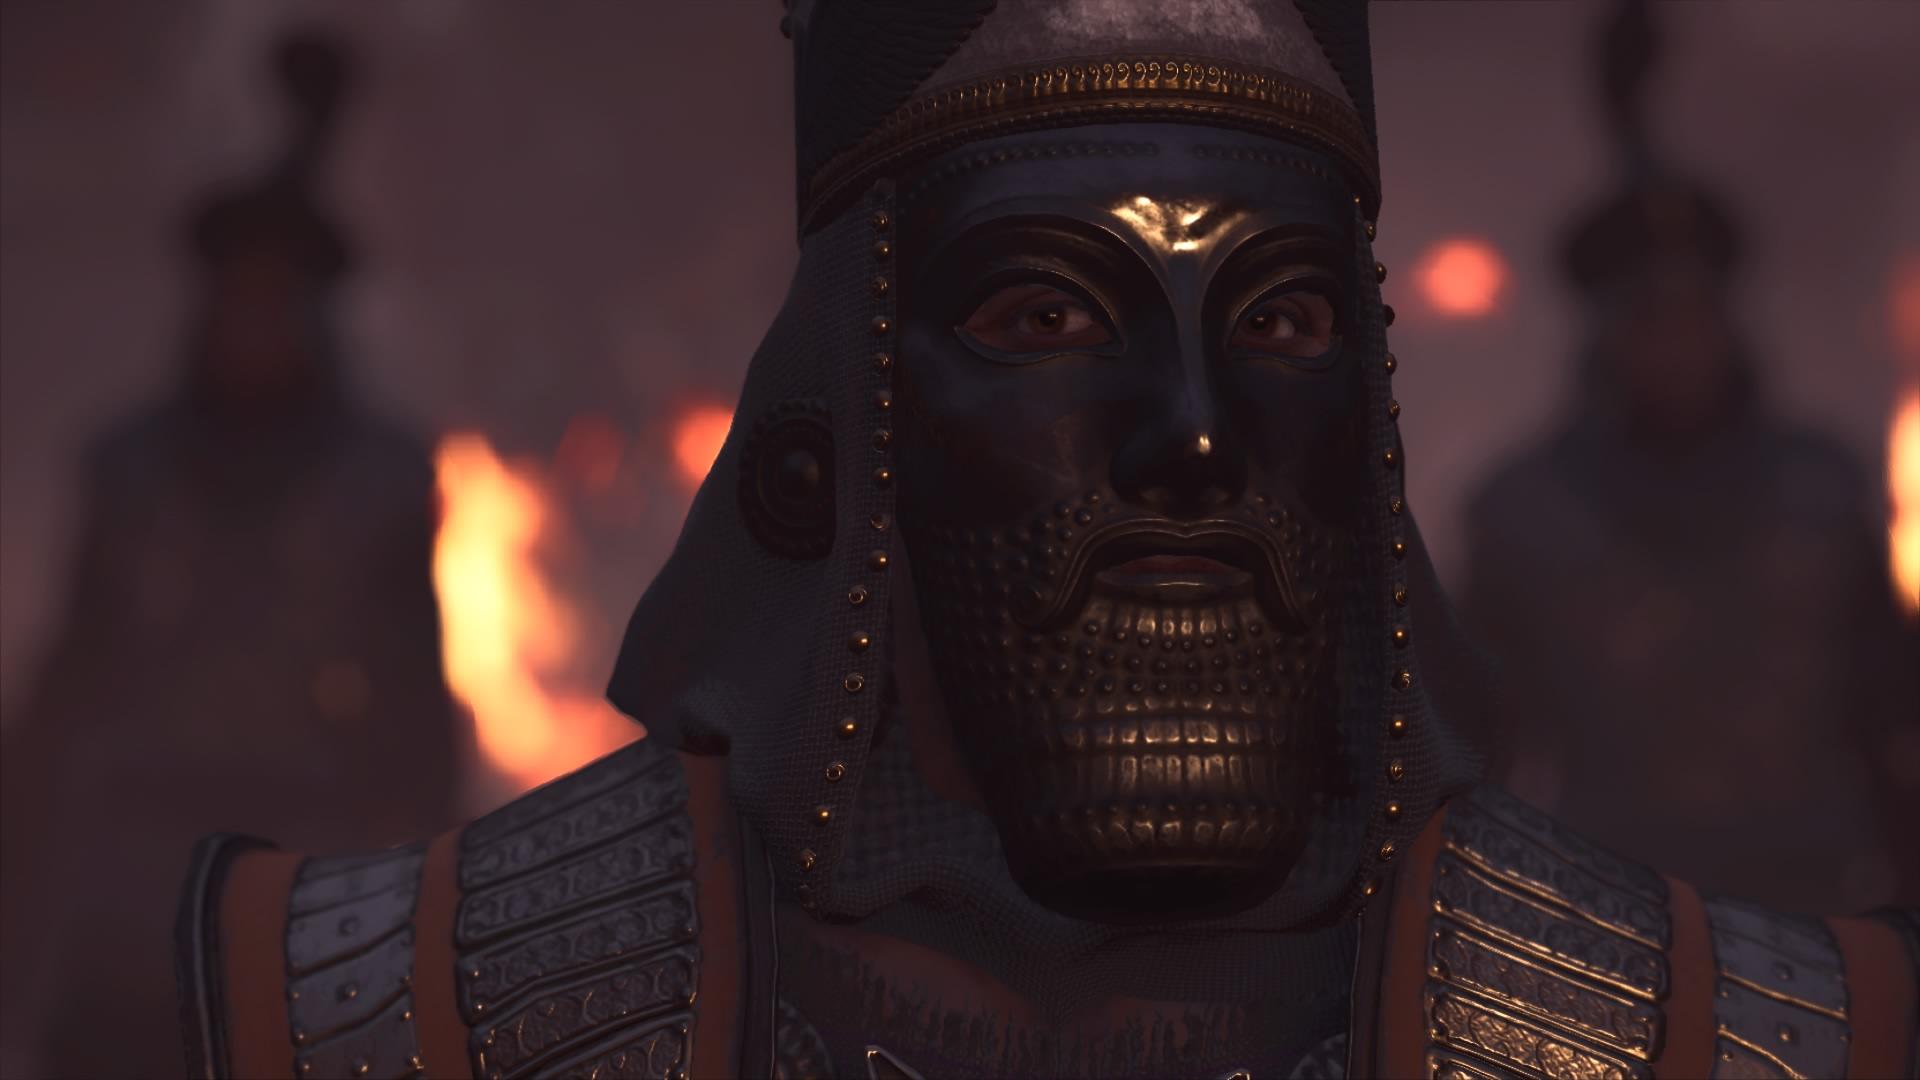 Assassin-sCreedOdyssey-L-HeritagedelaPremiereLame-Episode1 PS4 Test 003